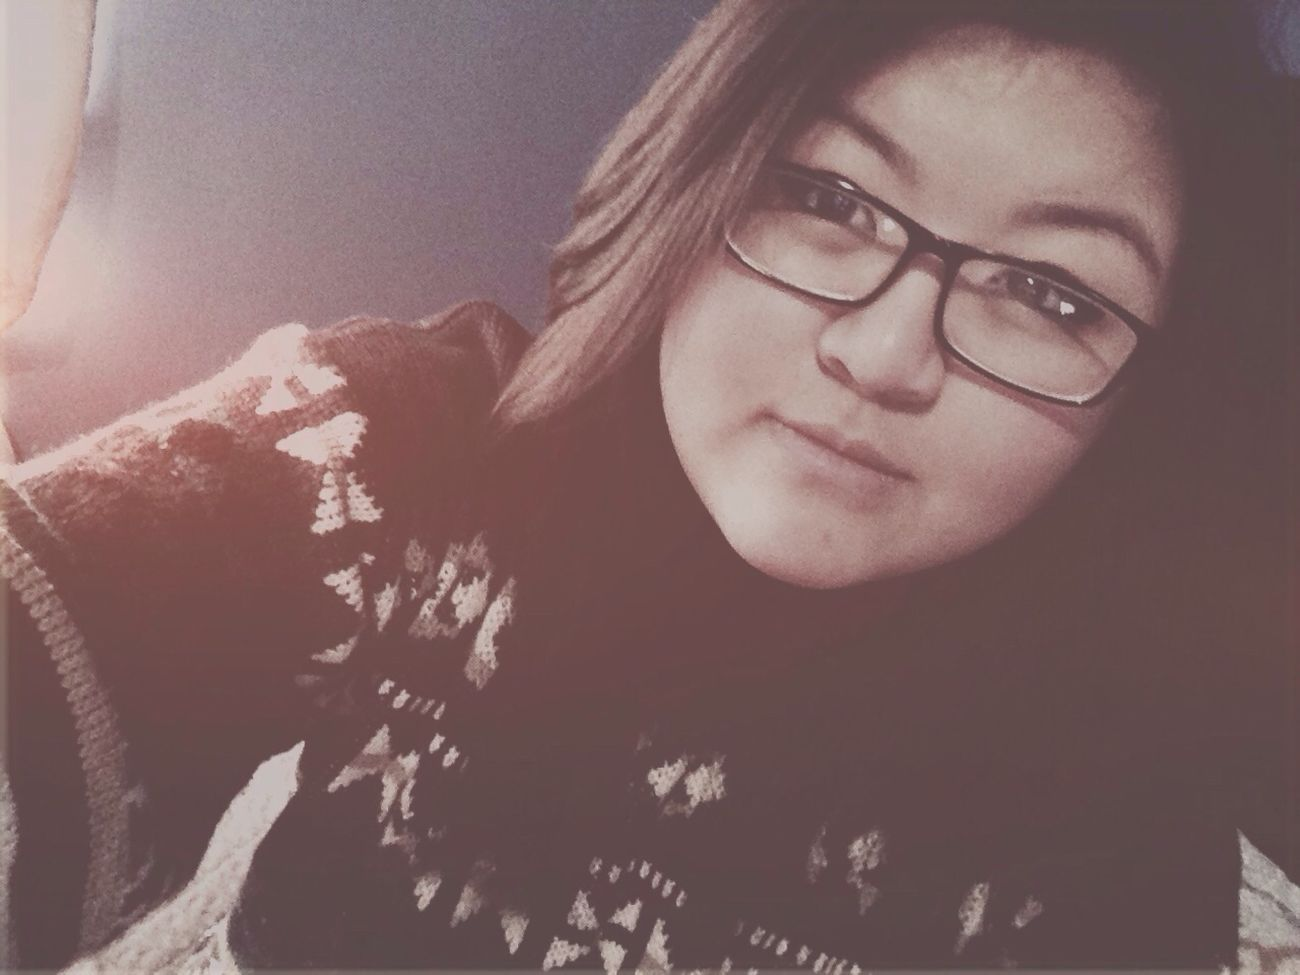 Selfportrait Selfie Sweaterweather Goodnight